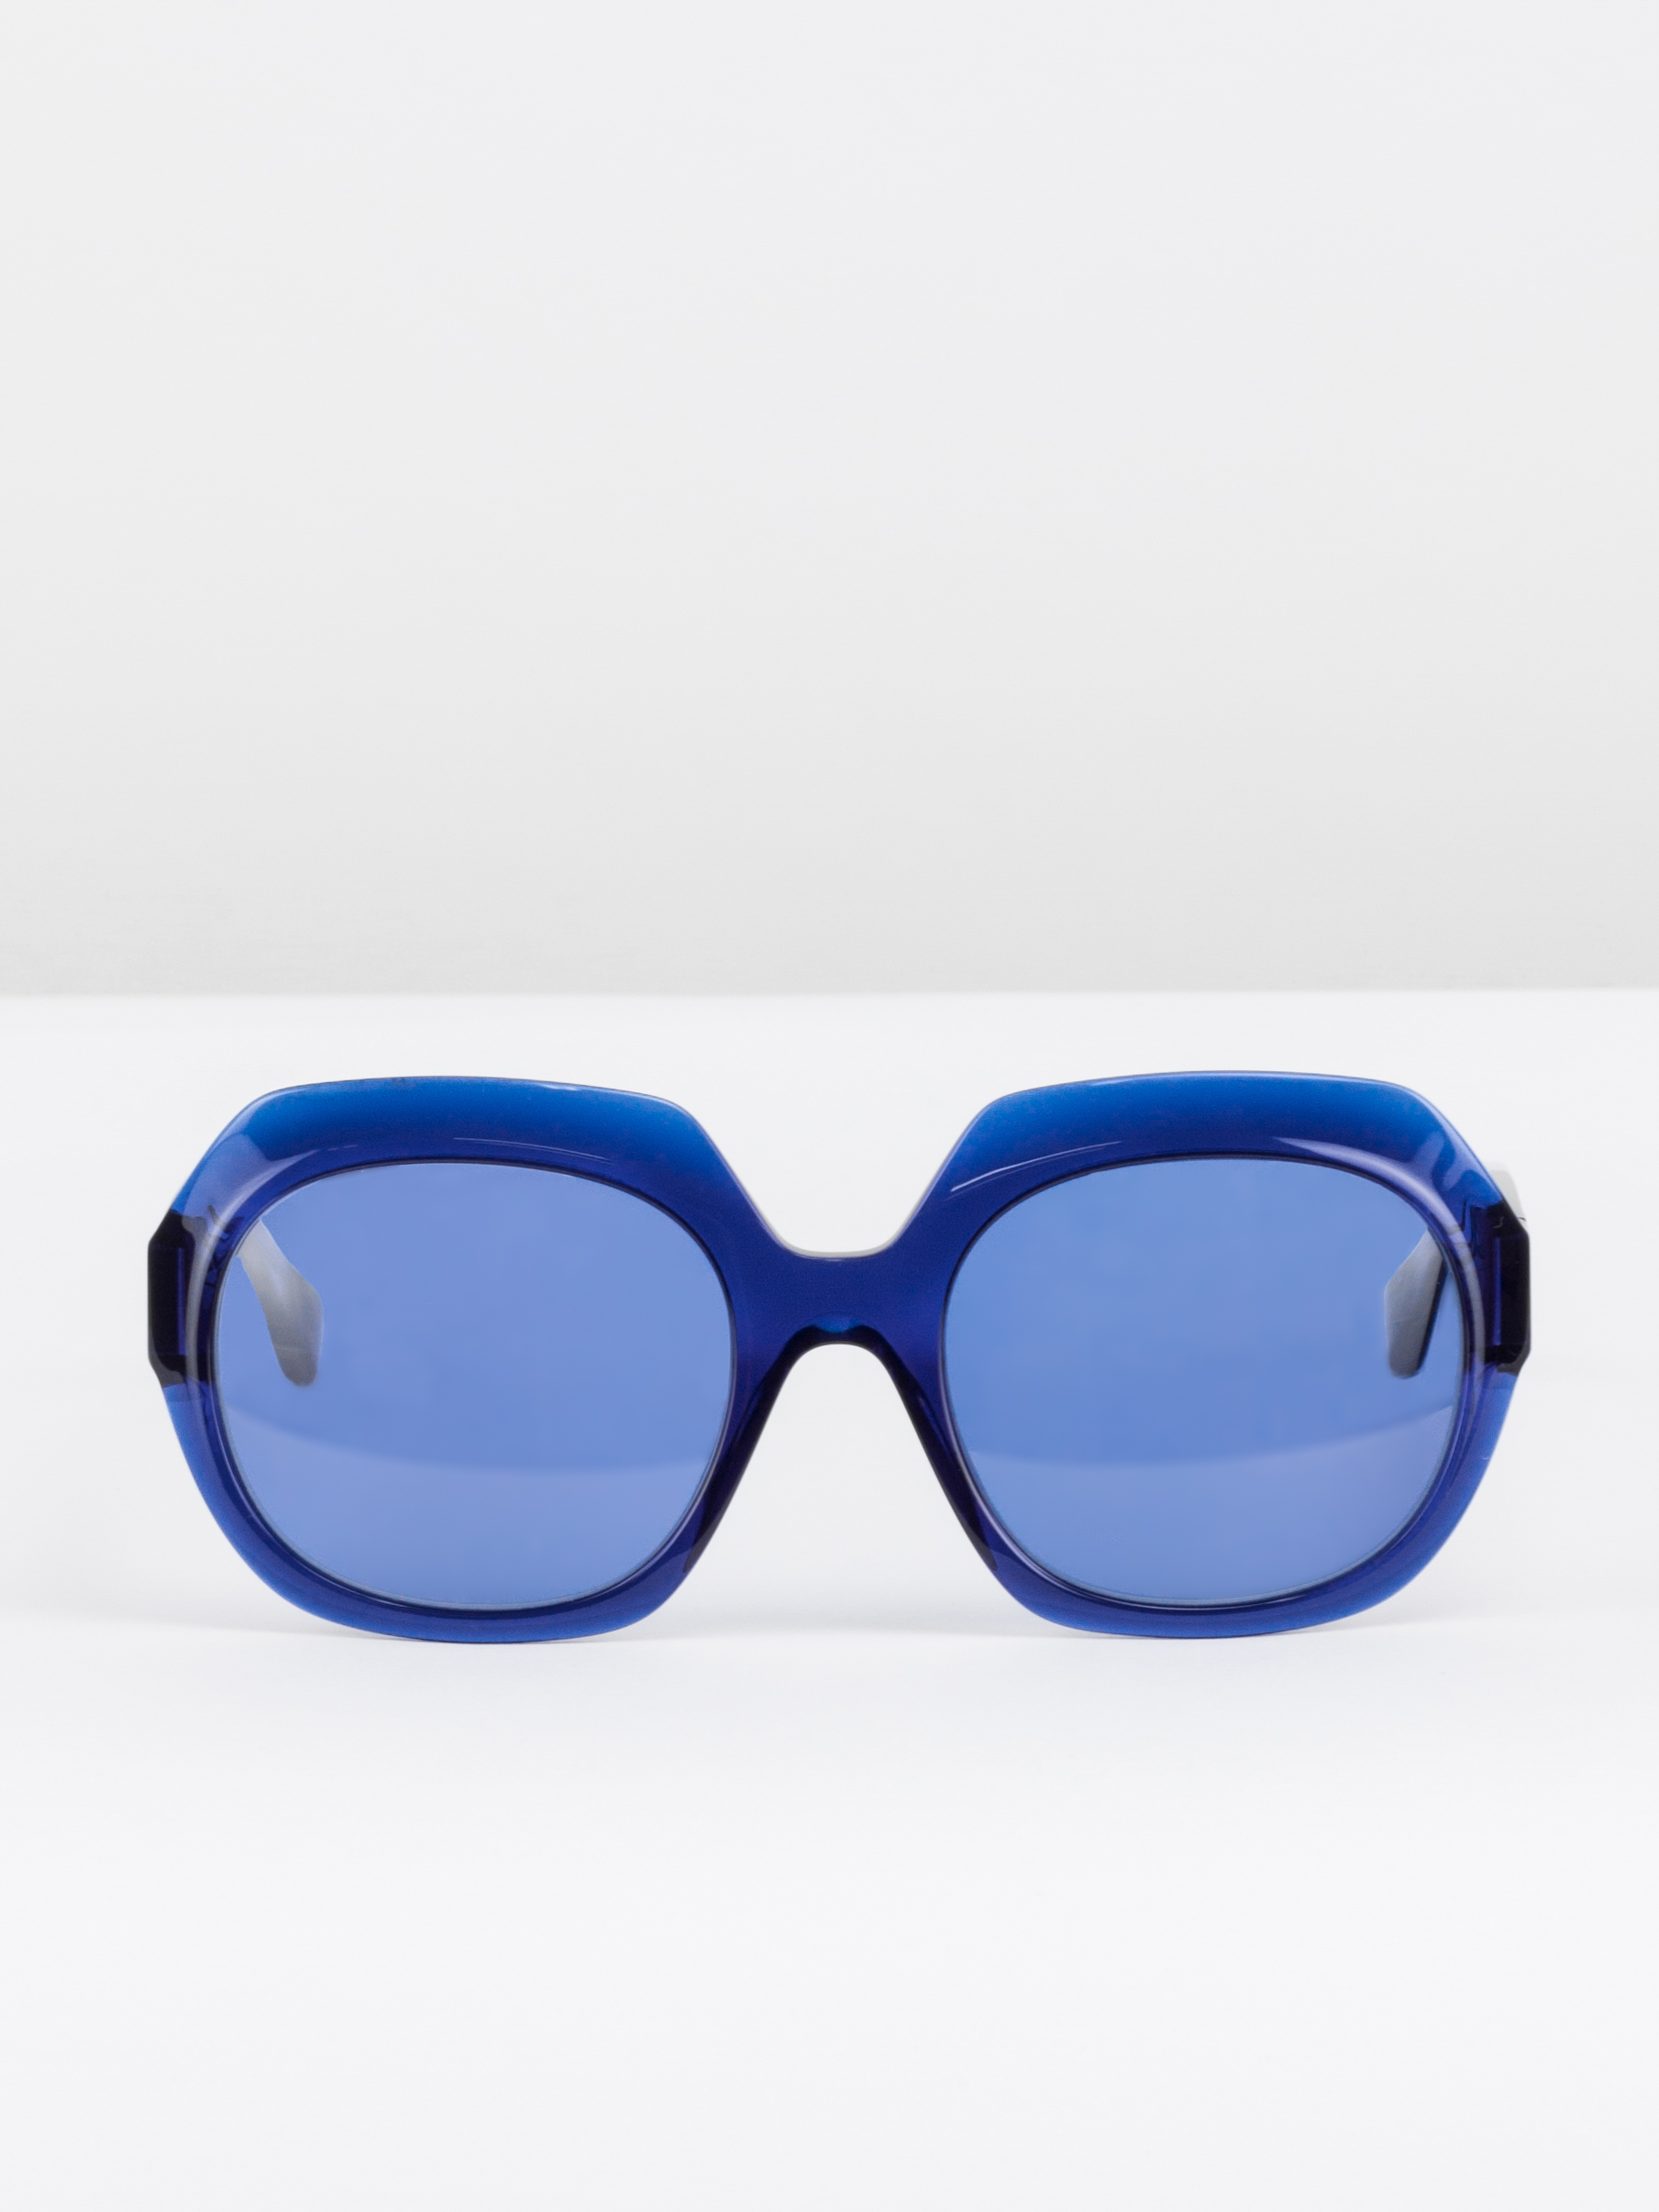 Sunglasses E-Commerce Packshot